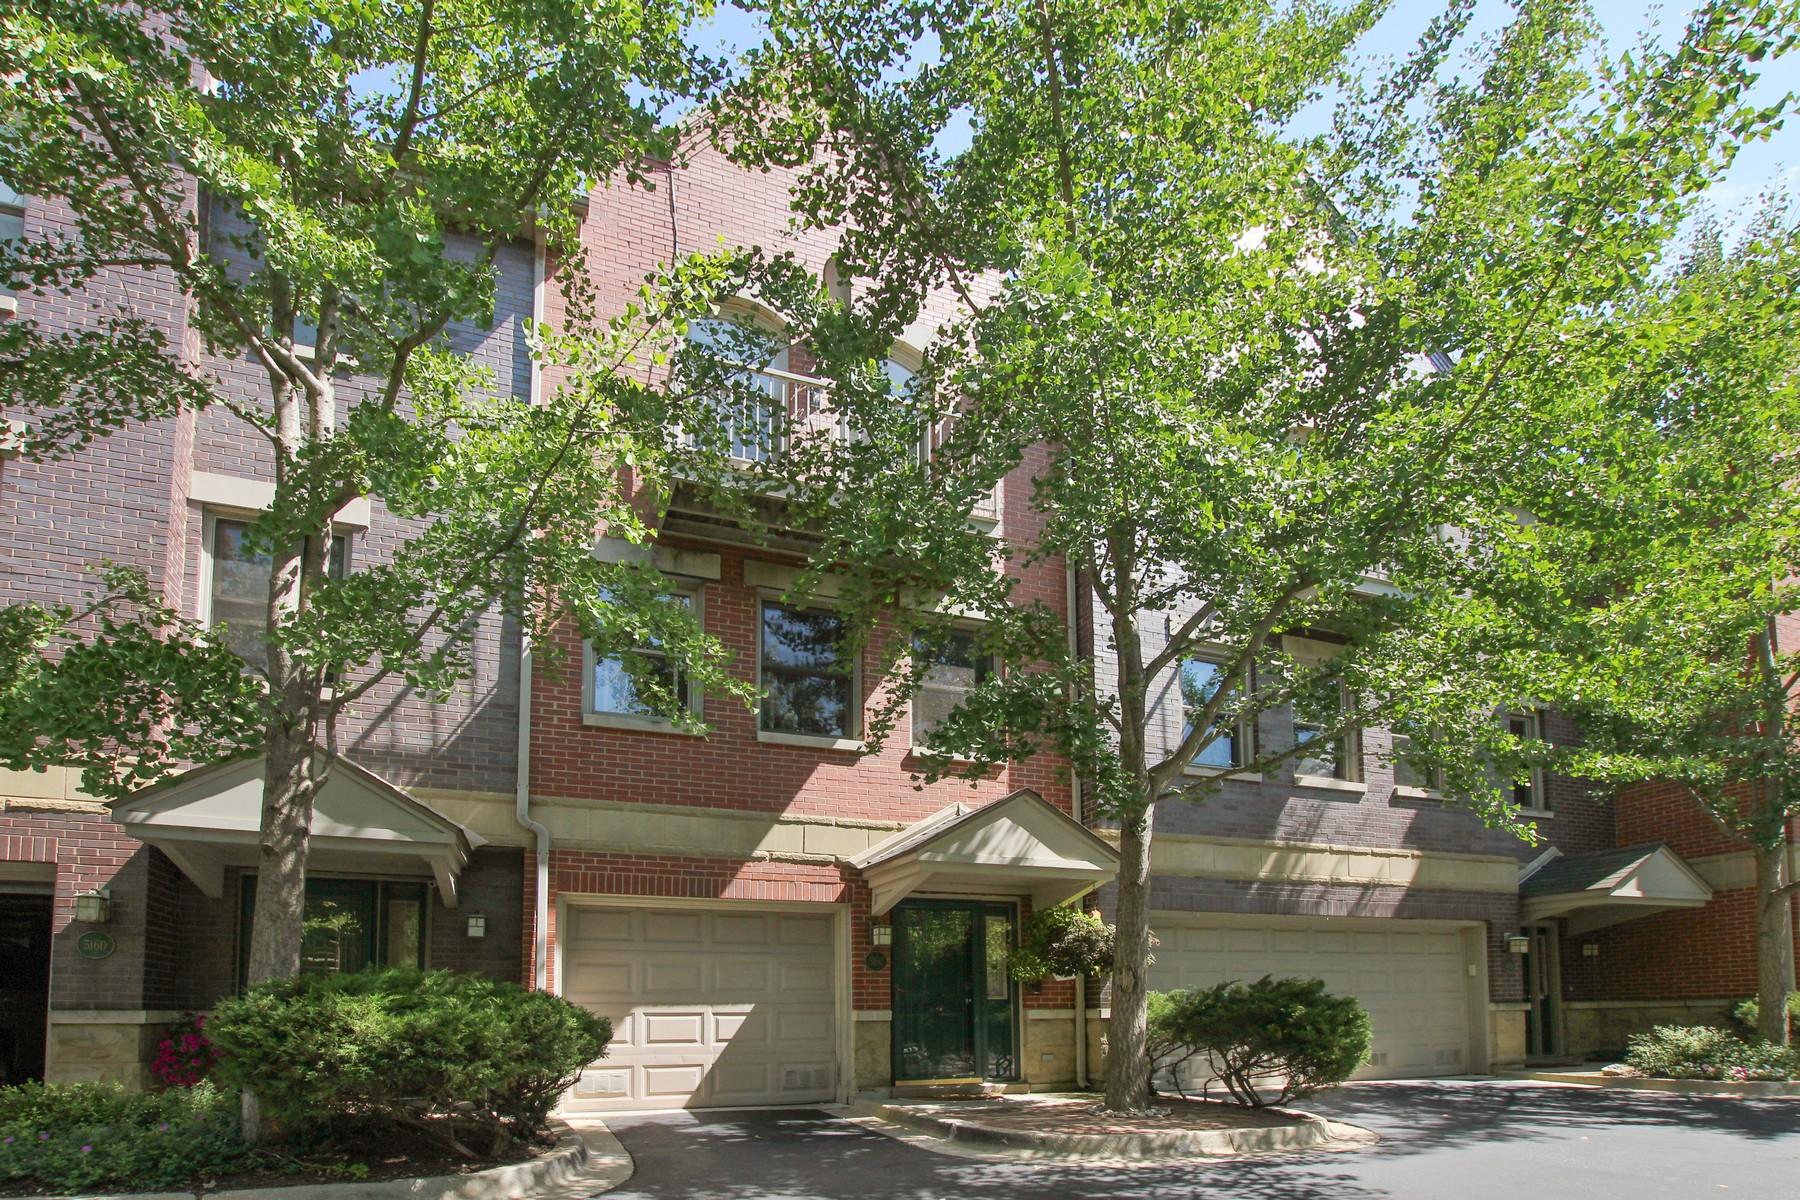 Residência urbana para Venda às City Living in Suburban Style 516 E 32nd Street Unit C Douglas, Chicago, Illinois, 60616 Estados Unidos